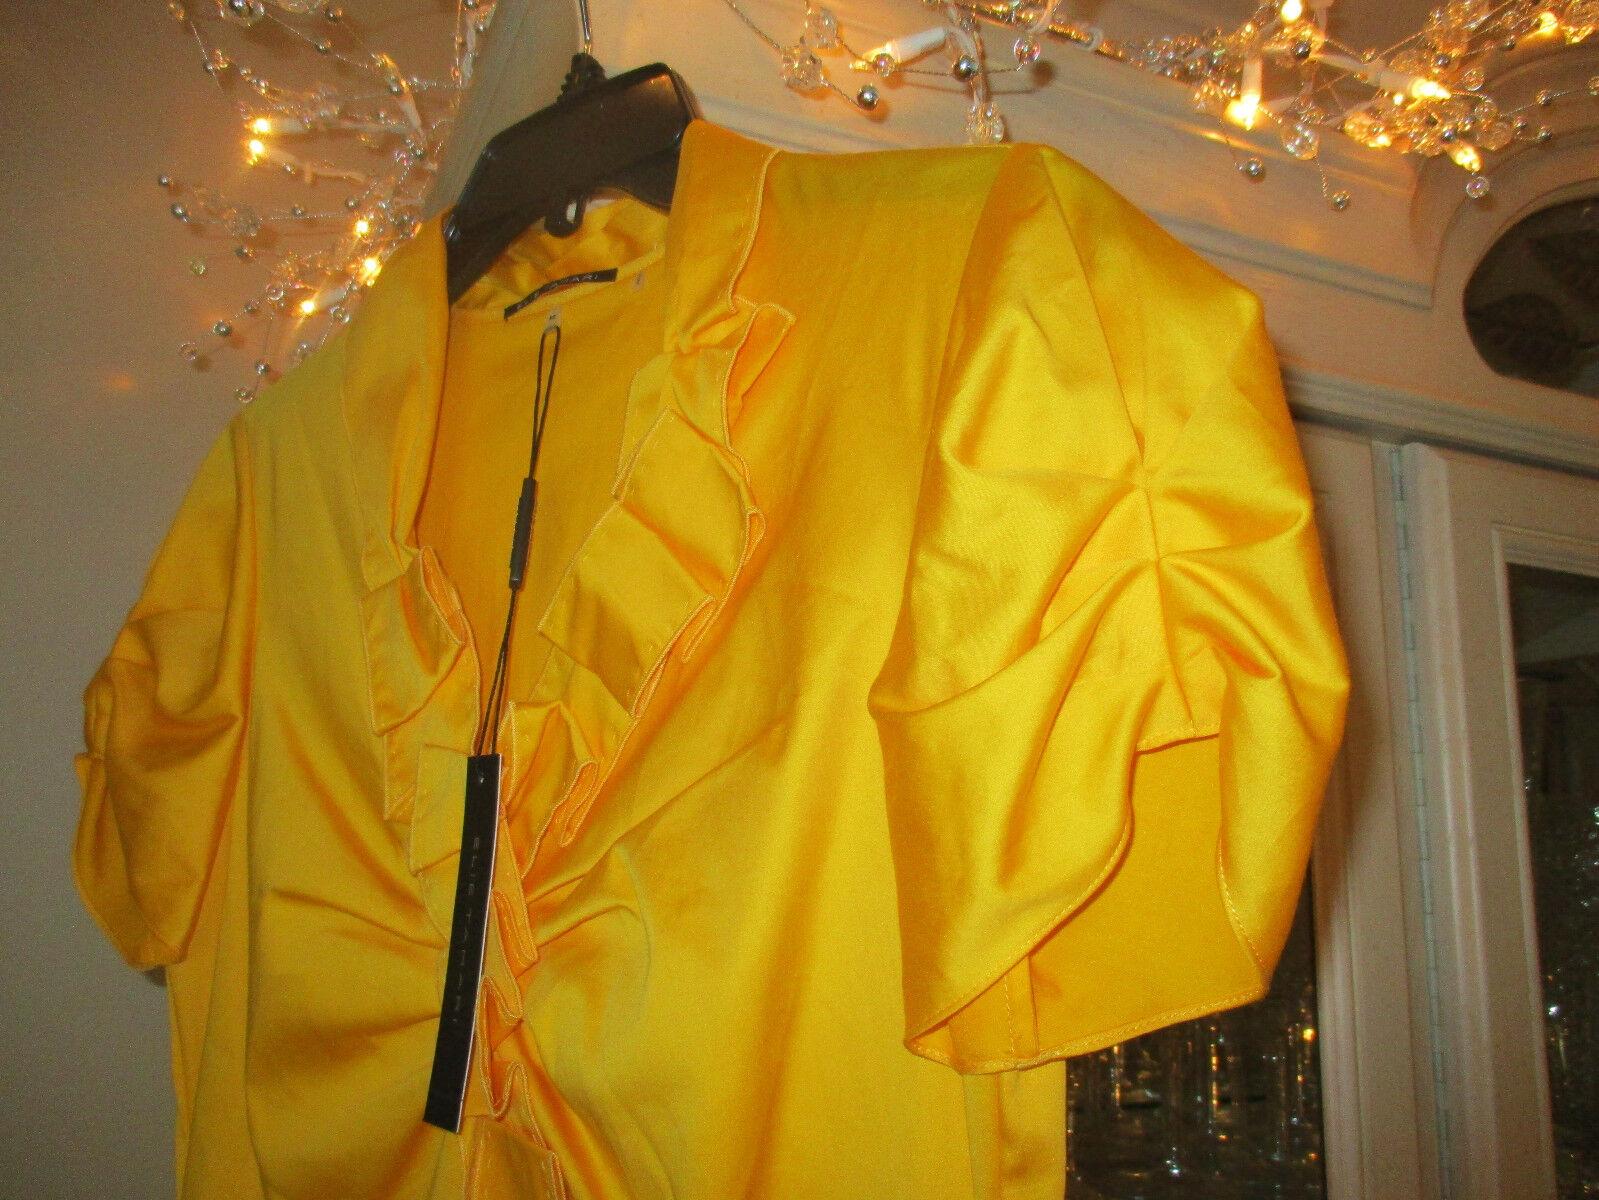 ELIE TAHARI BEESWAX BEESWAX BEESWAX COLOR LINDY DRESS   NWT  278 d46f9b